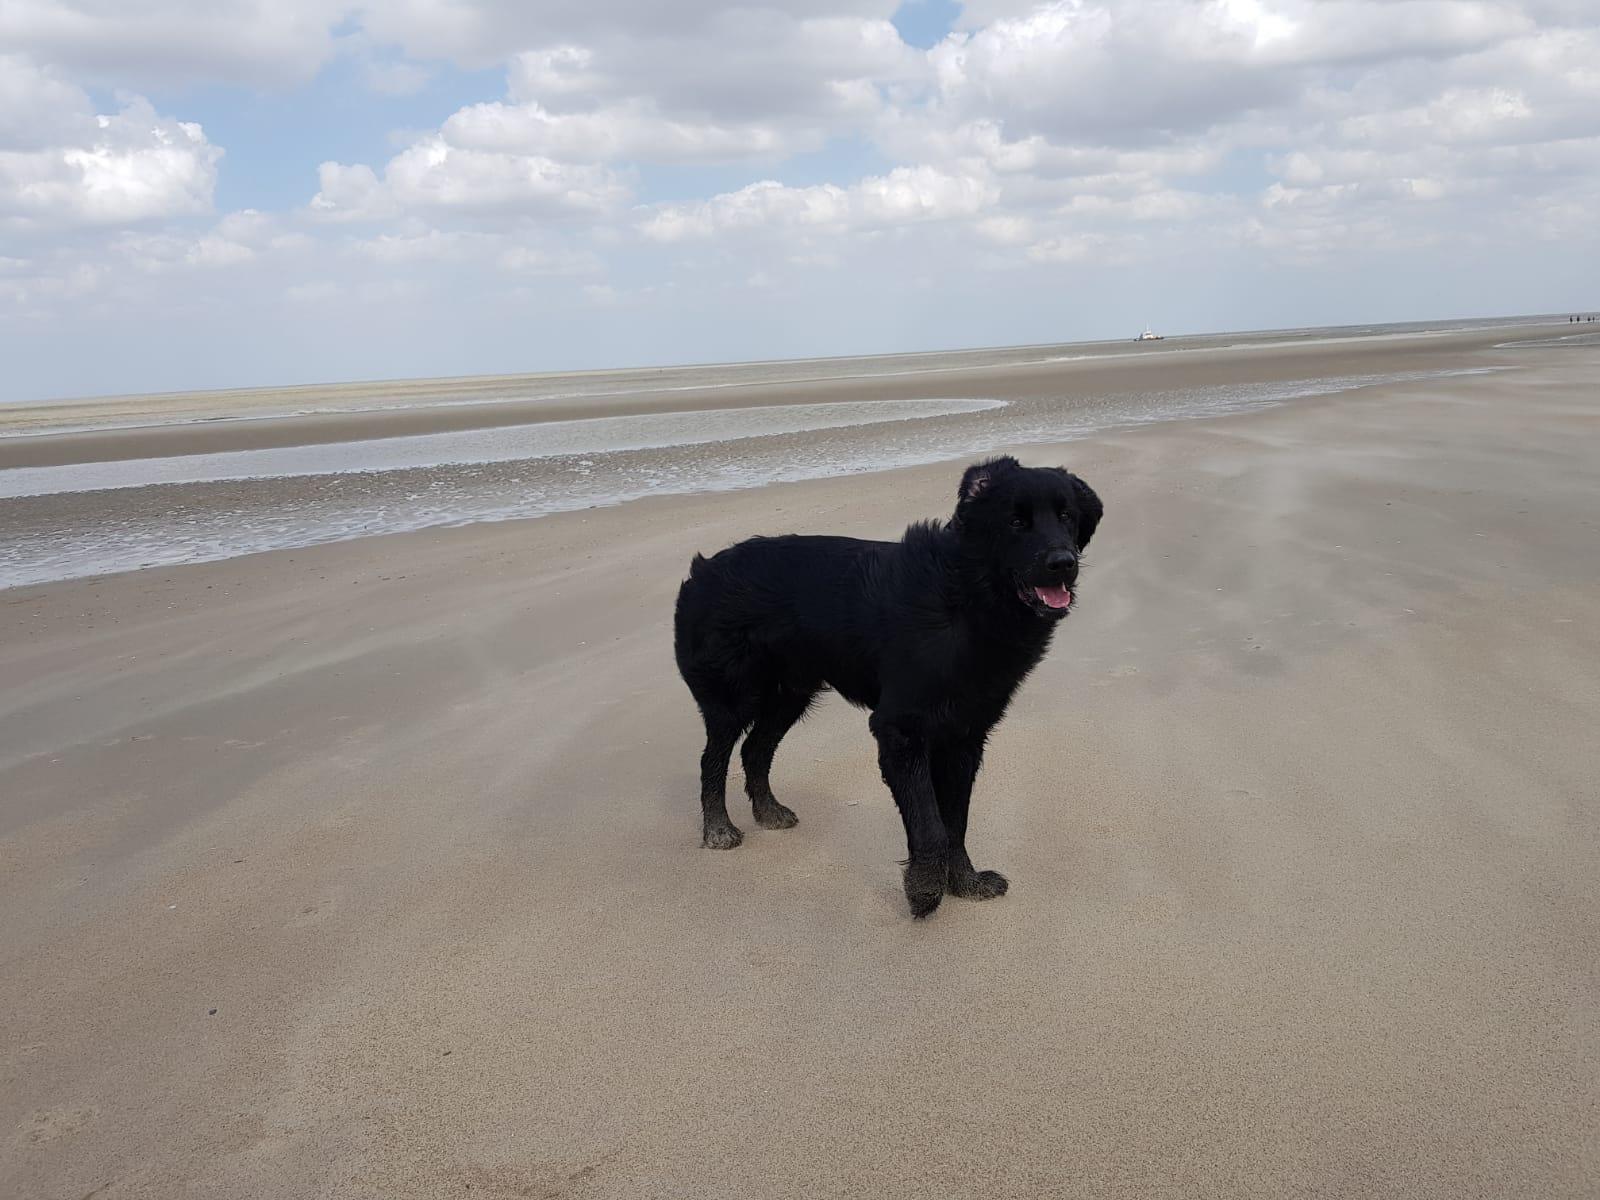 Artos der Strandgänger  grüsst aus Belgien